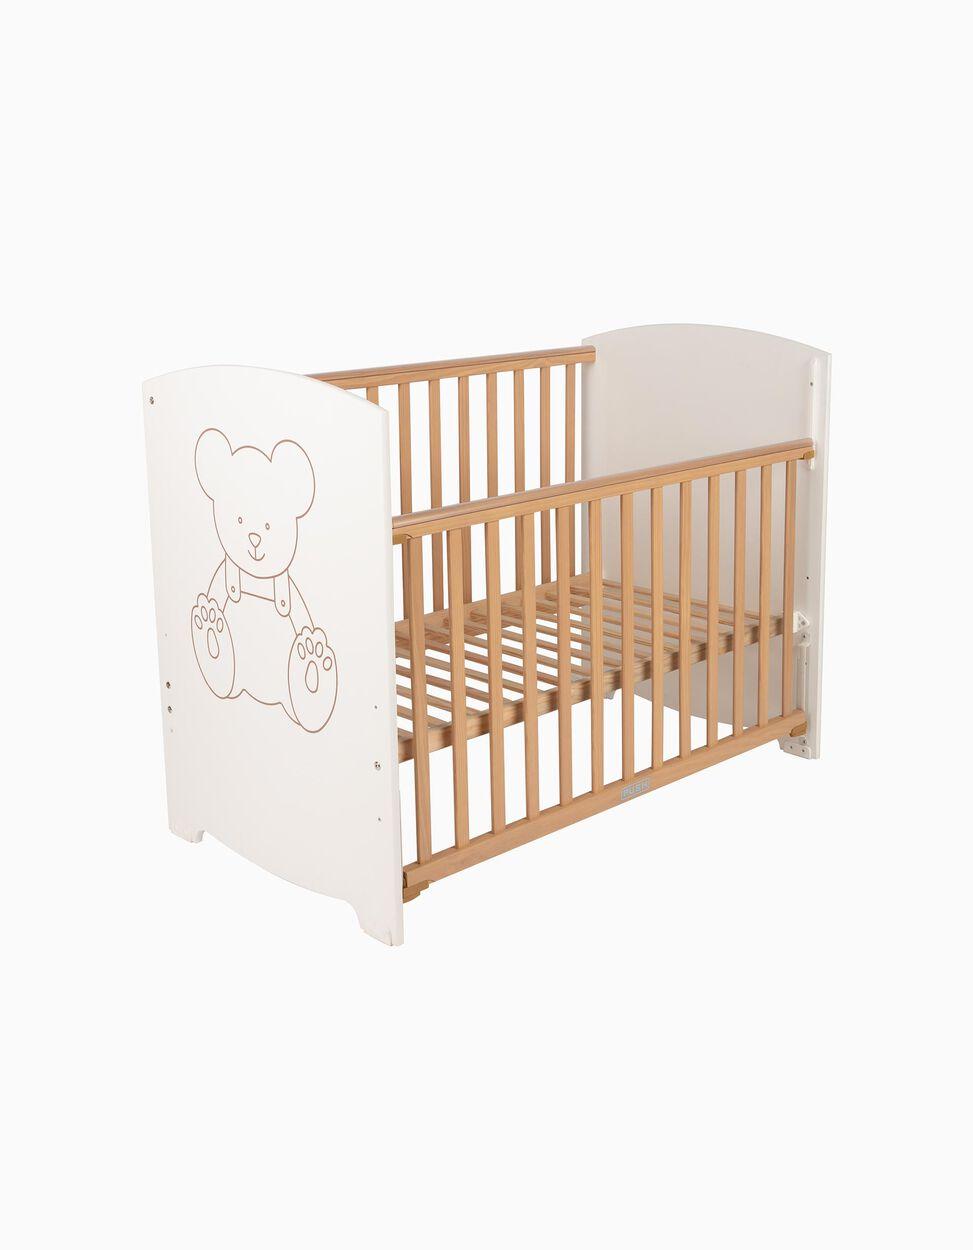 Cama New Bear120x60 cm Zy Baby